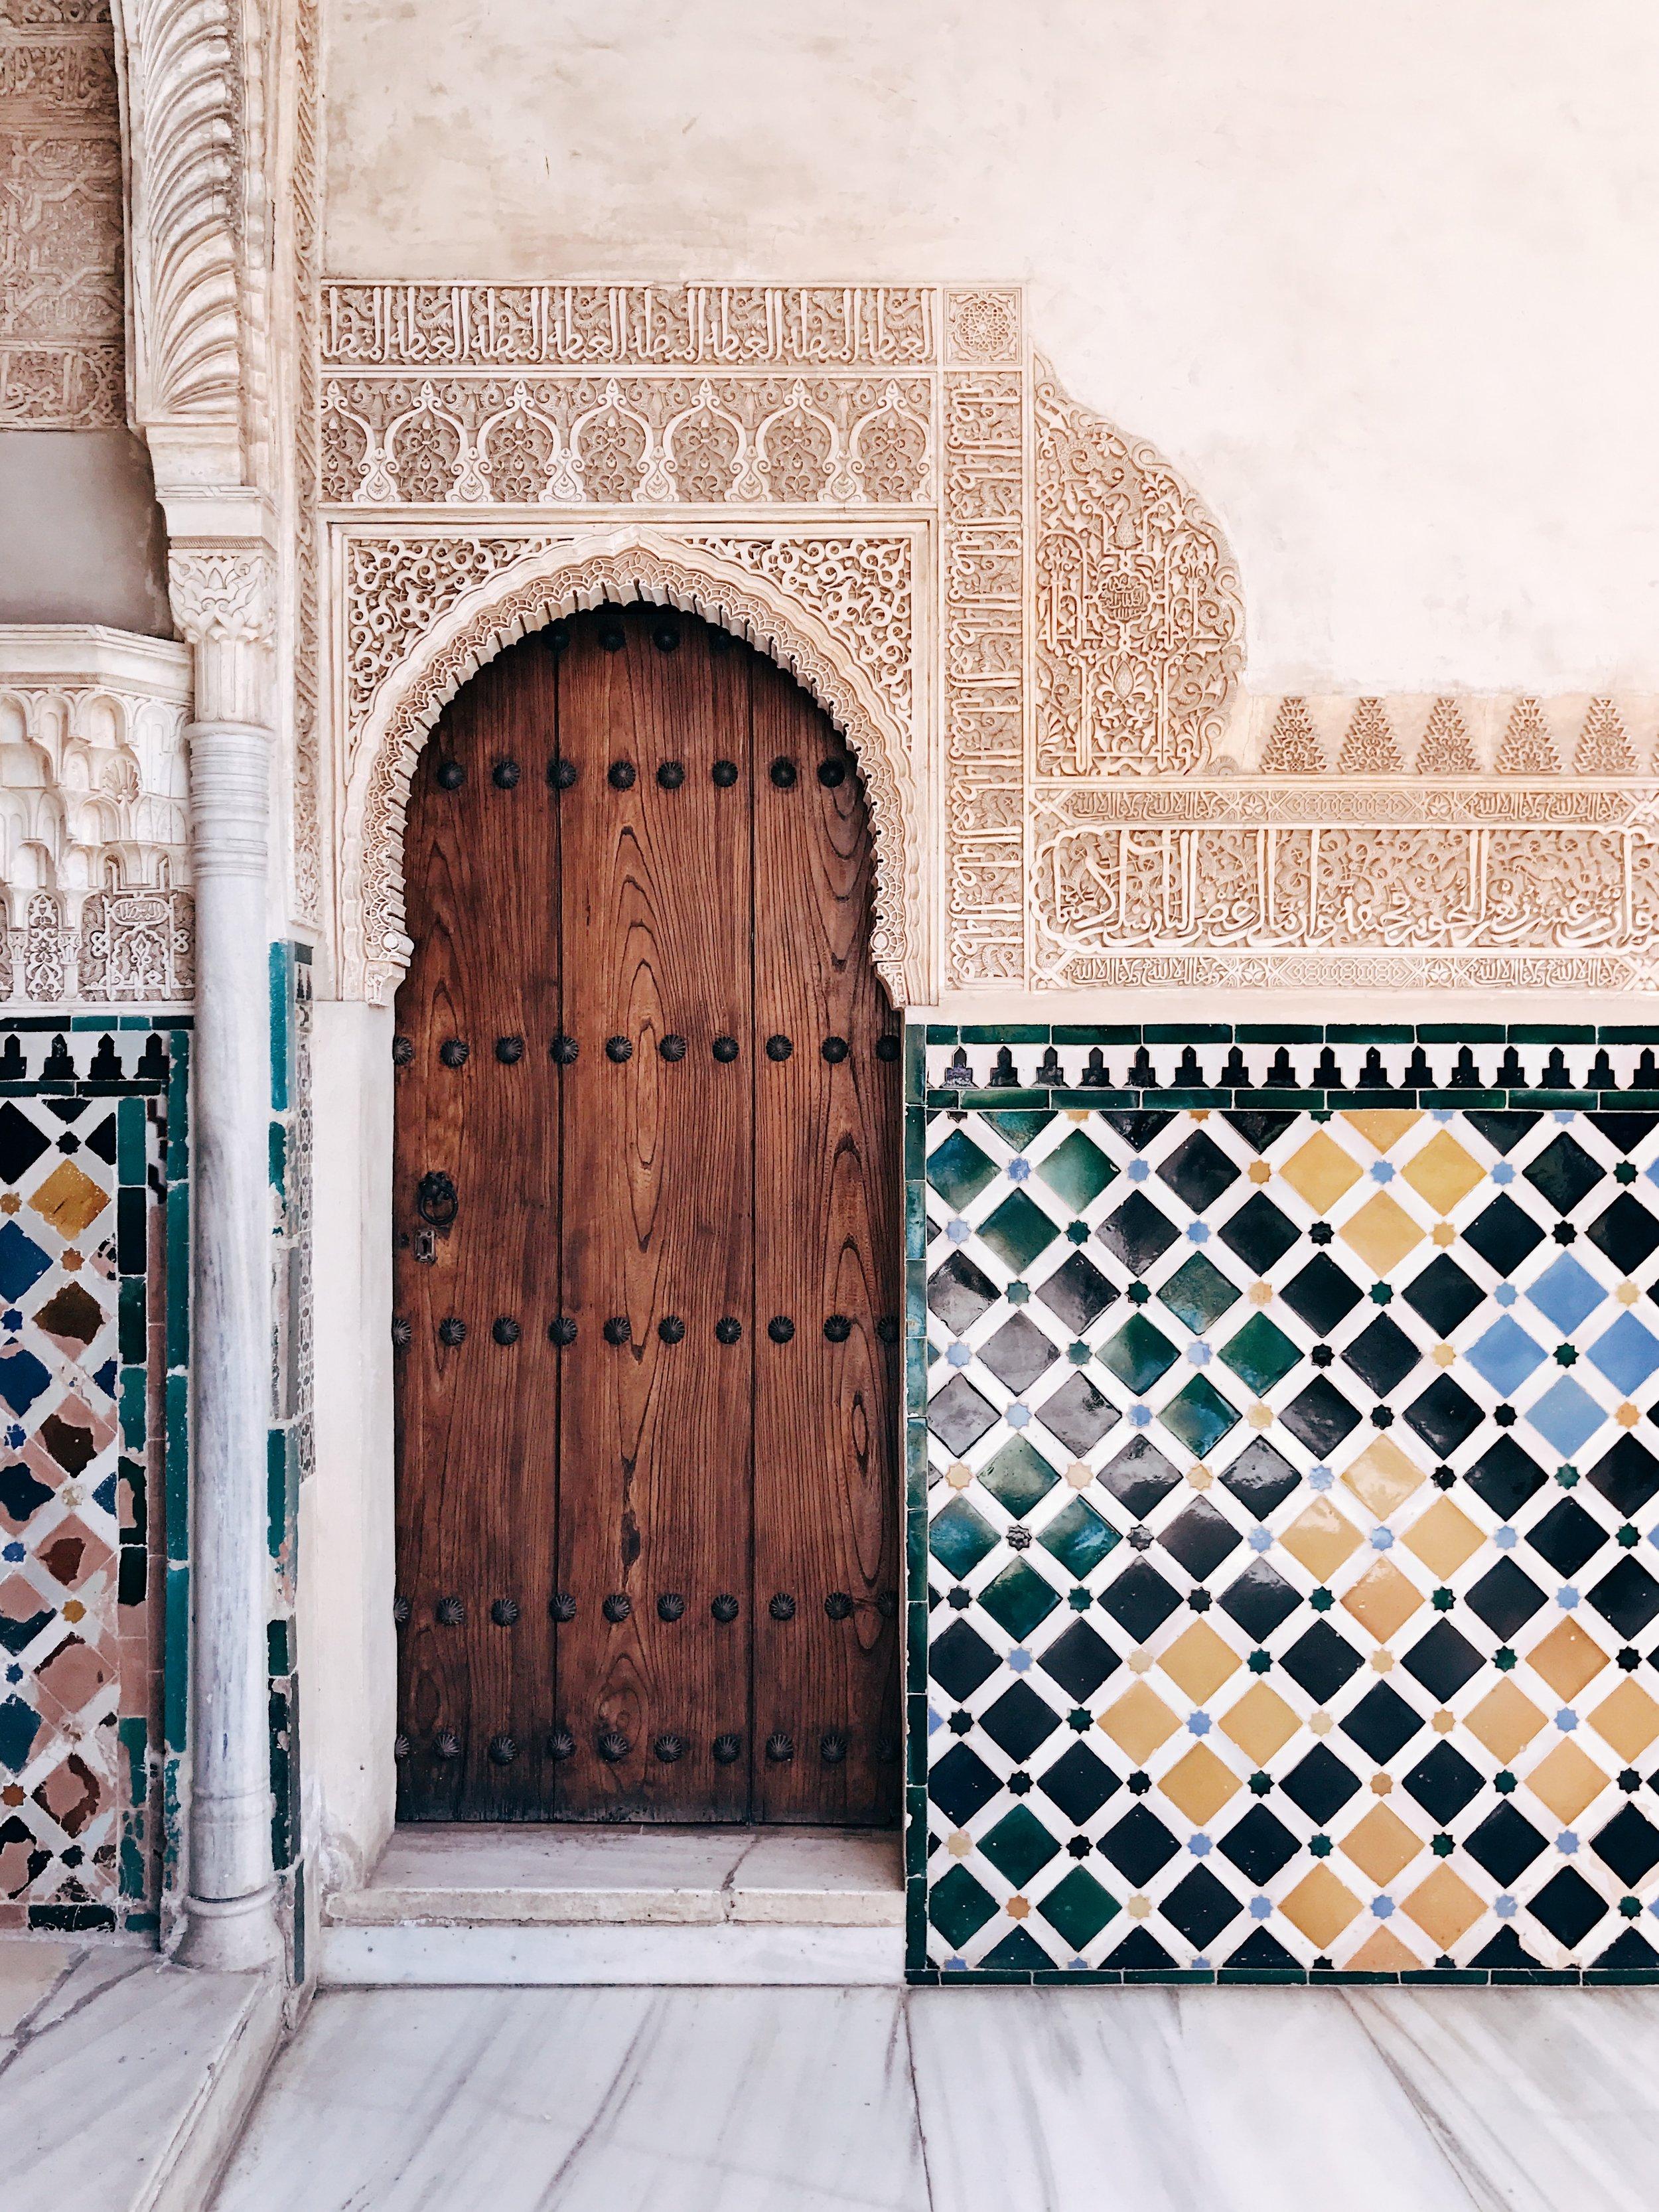 Image: Where to Travel in 2018 - Alhambra - Granada